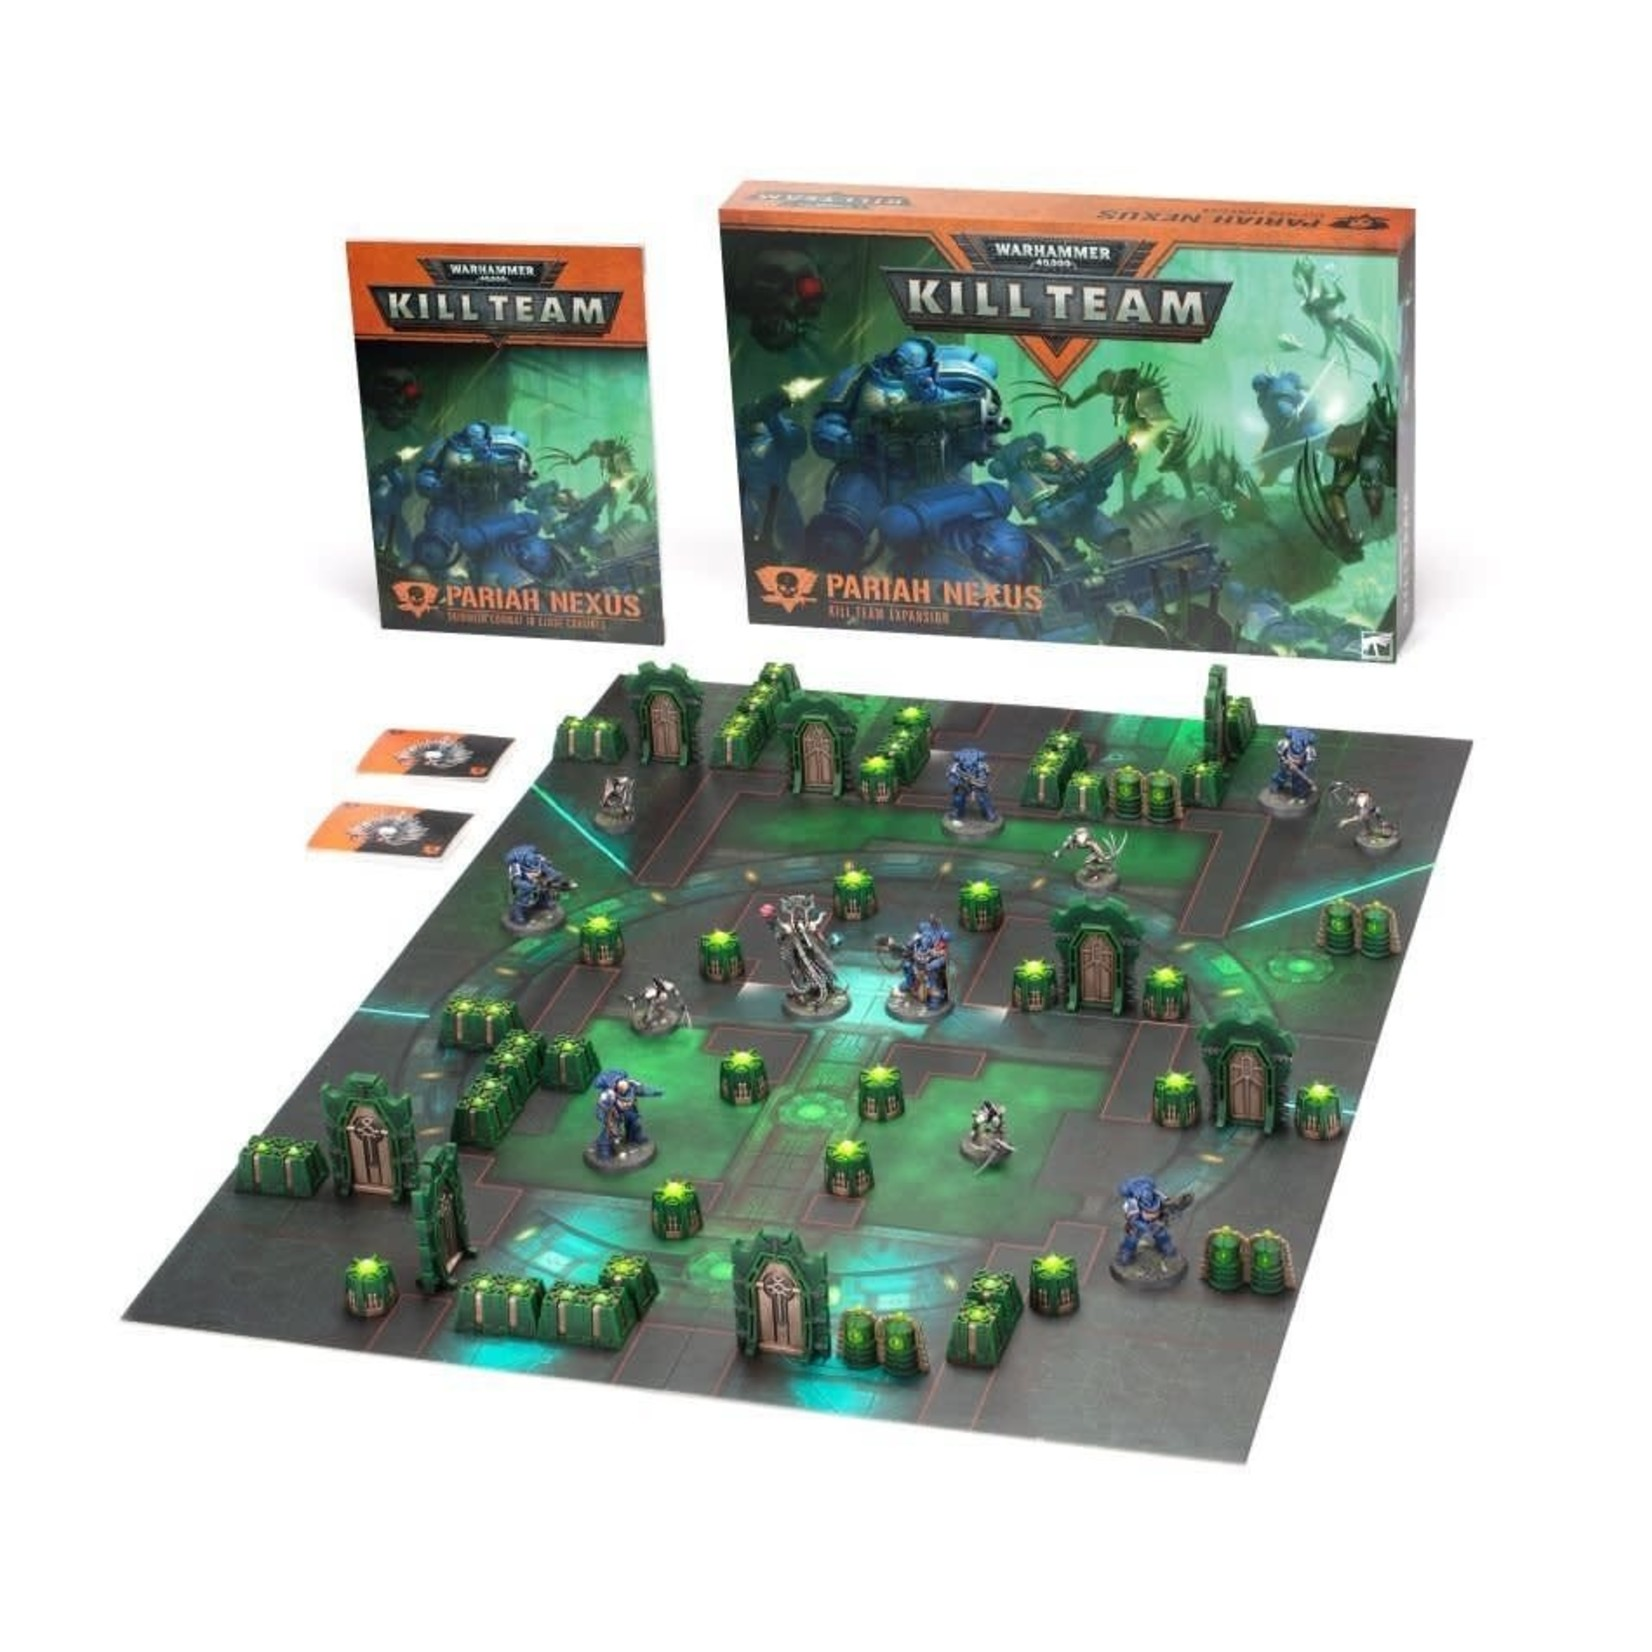 Games Workshop Warhammer 40k: Kill Team - Pariah Nexus